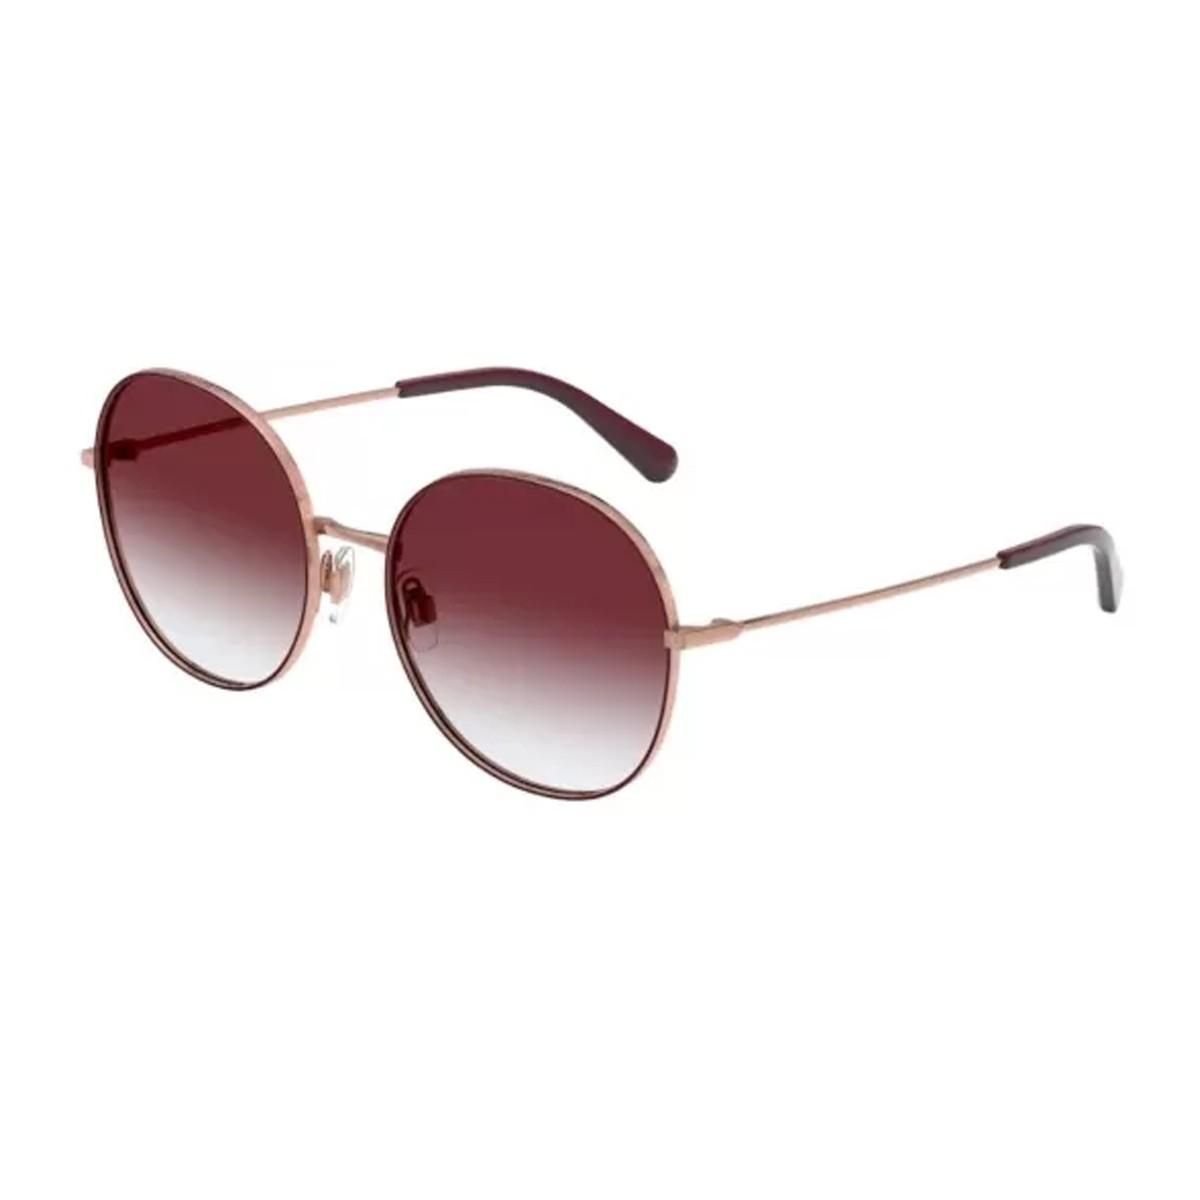 Dolce & Gabbana DG 2243 | Women's sunglasses